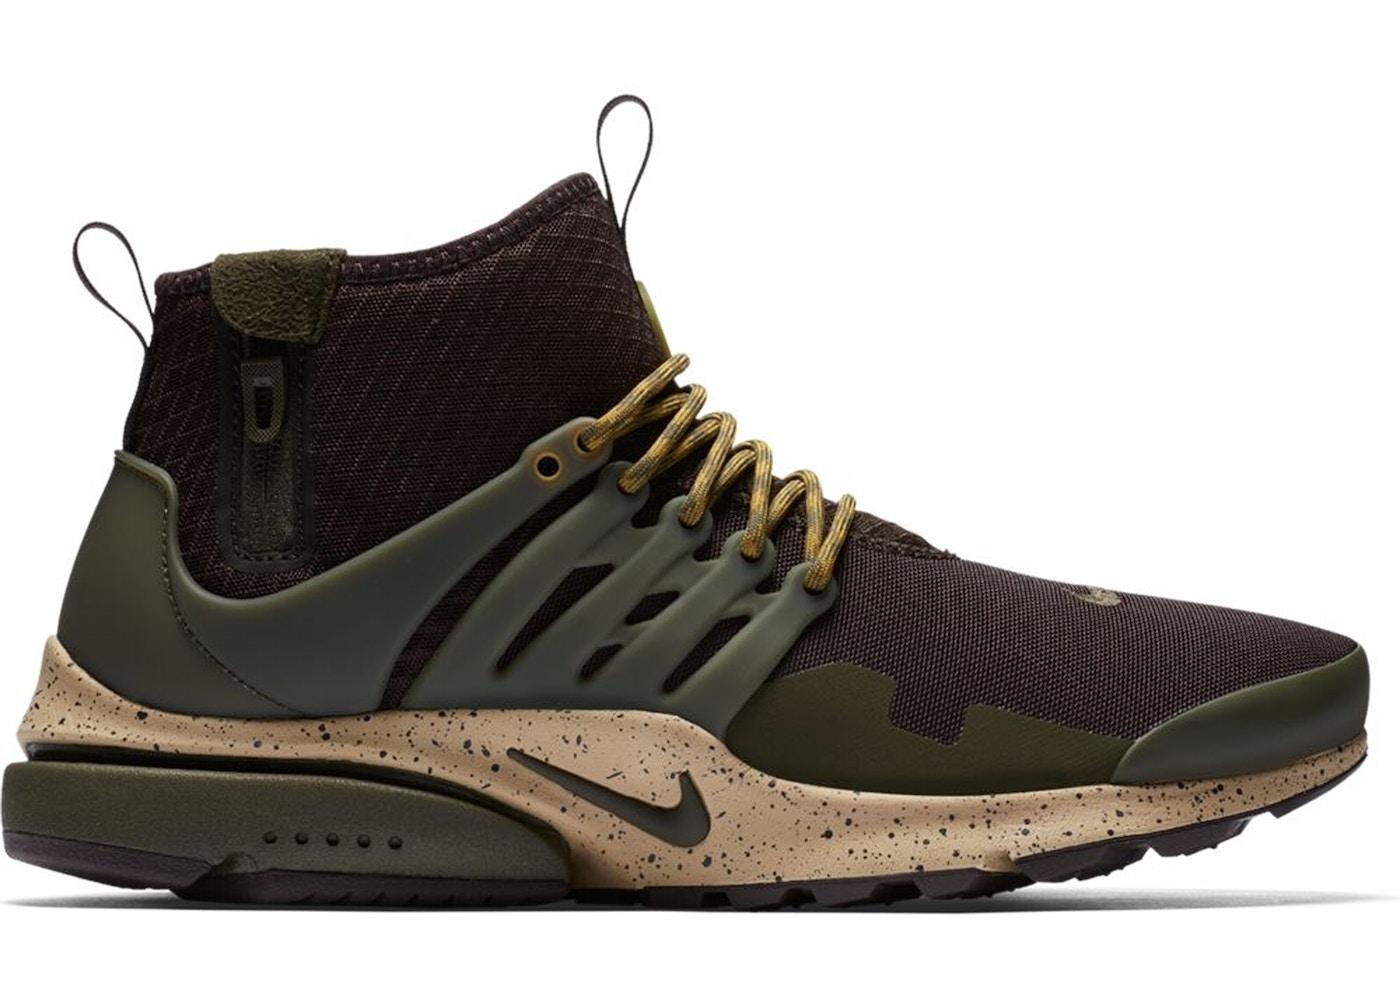 Nike Air Presto Mid Utility Velvet Brown